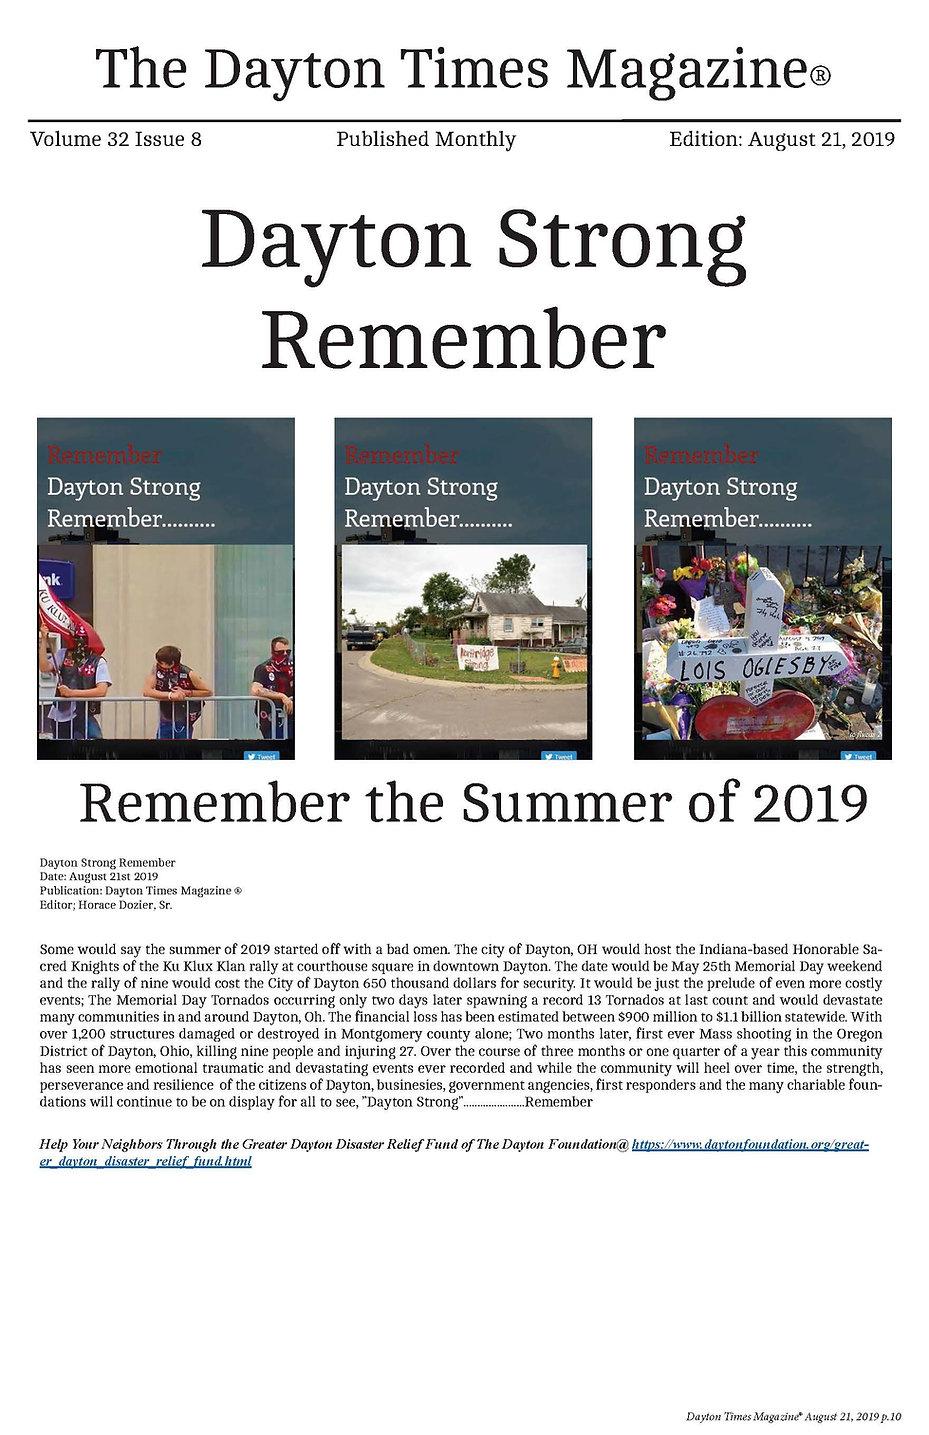 The Dayton Times Magazine Article_Rememb